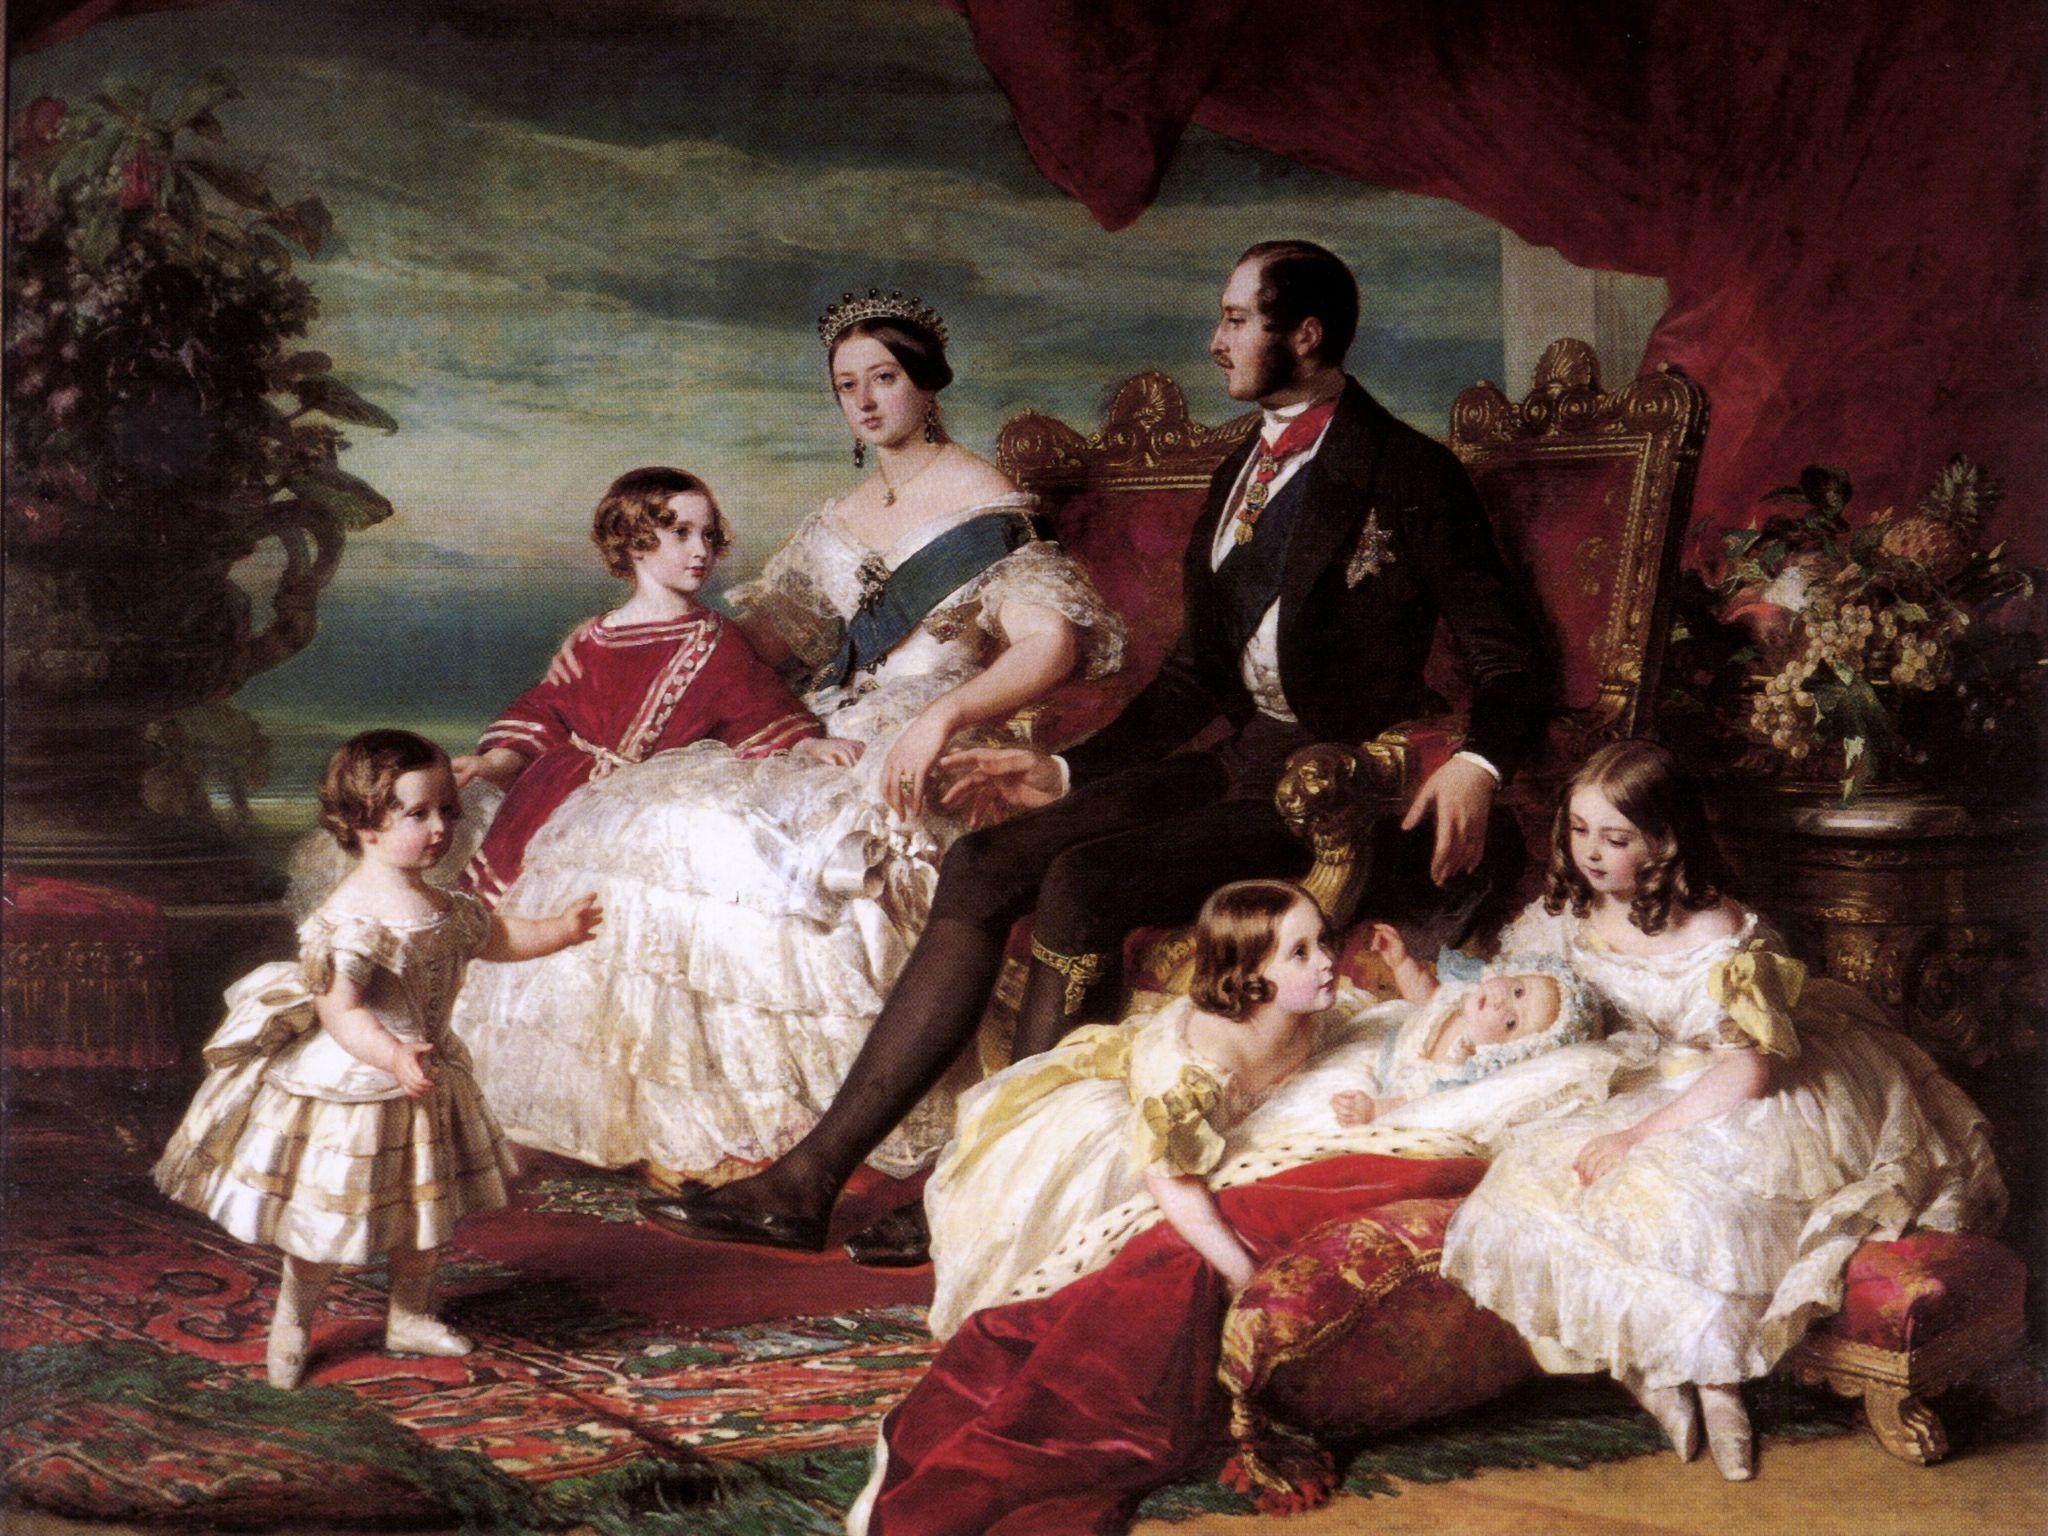 Обои картина, Флоринда, Franz Xaver Winterhalter, Франц Ксавер Винтерхальтер, мифология. Разное foto 7